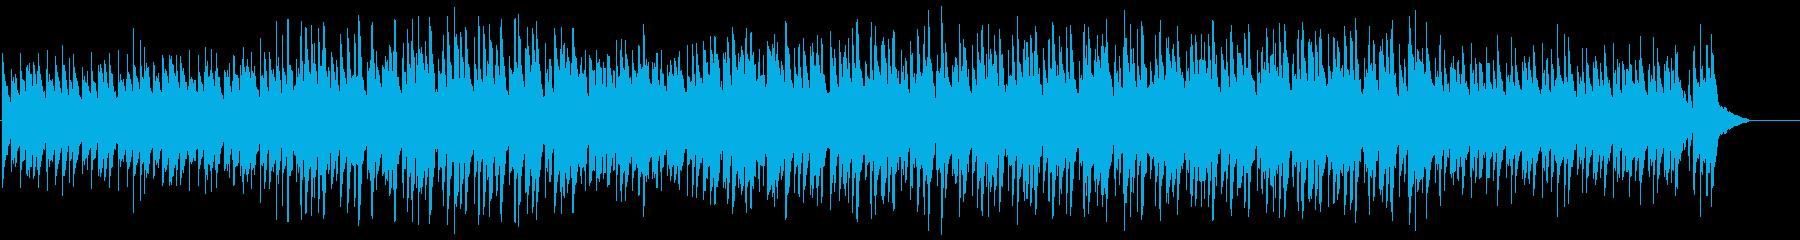 Impressive and loving piano drama accompaniment's reproduced waveform